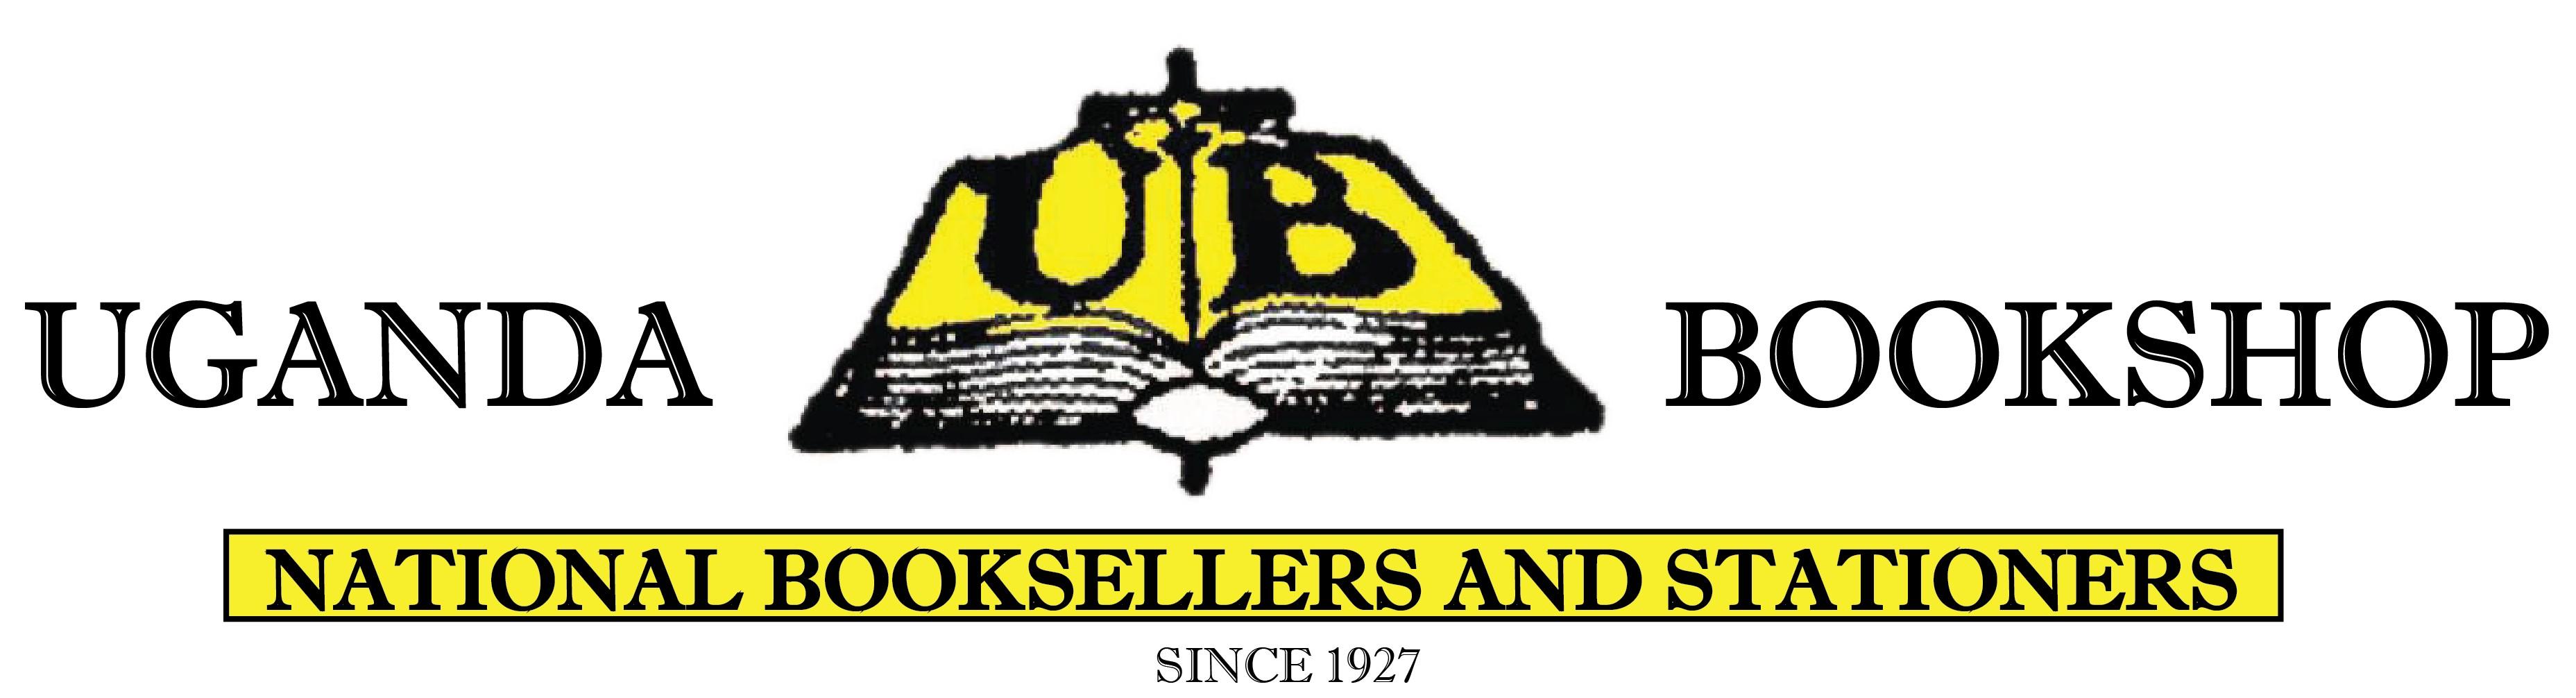 Uganda Bookshop